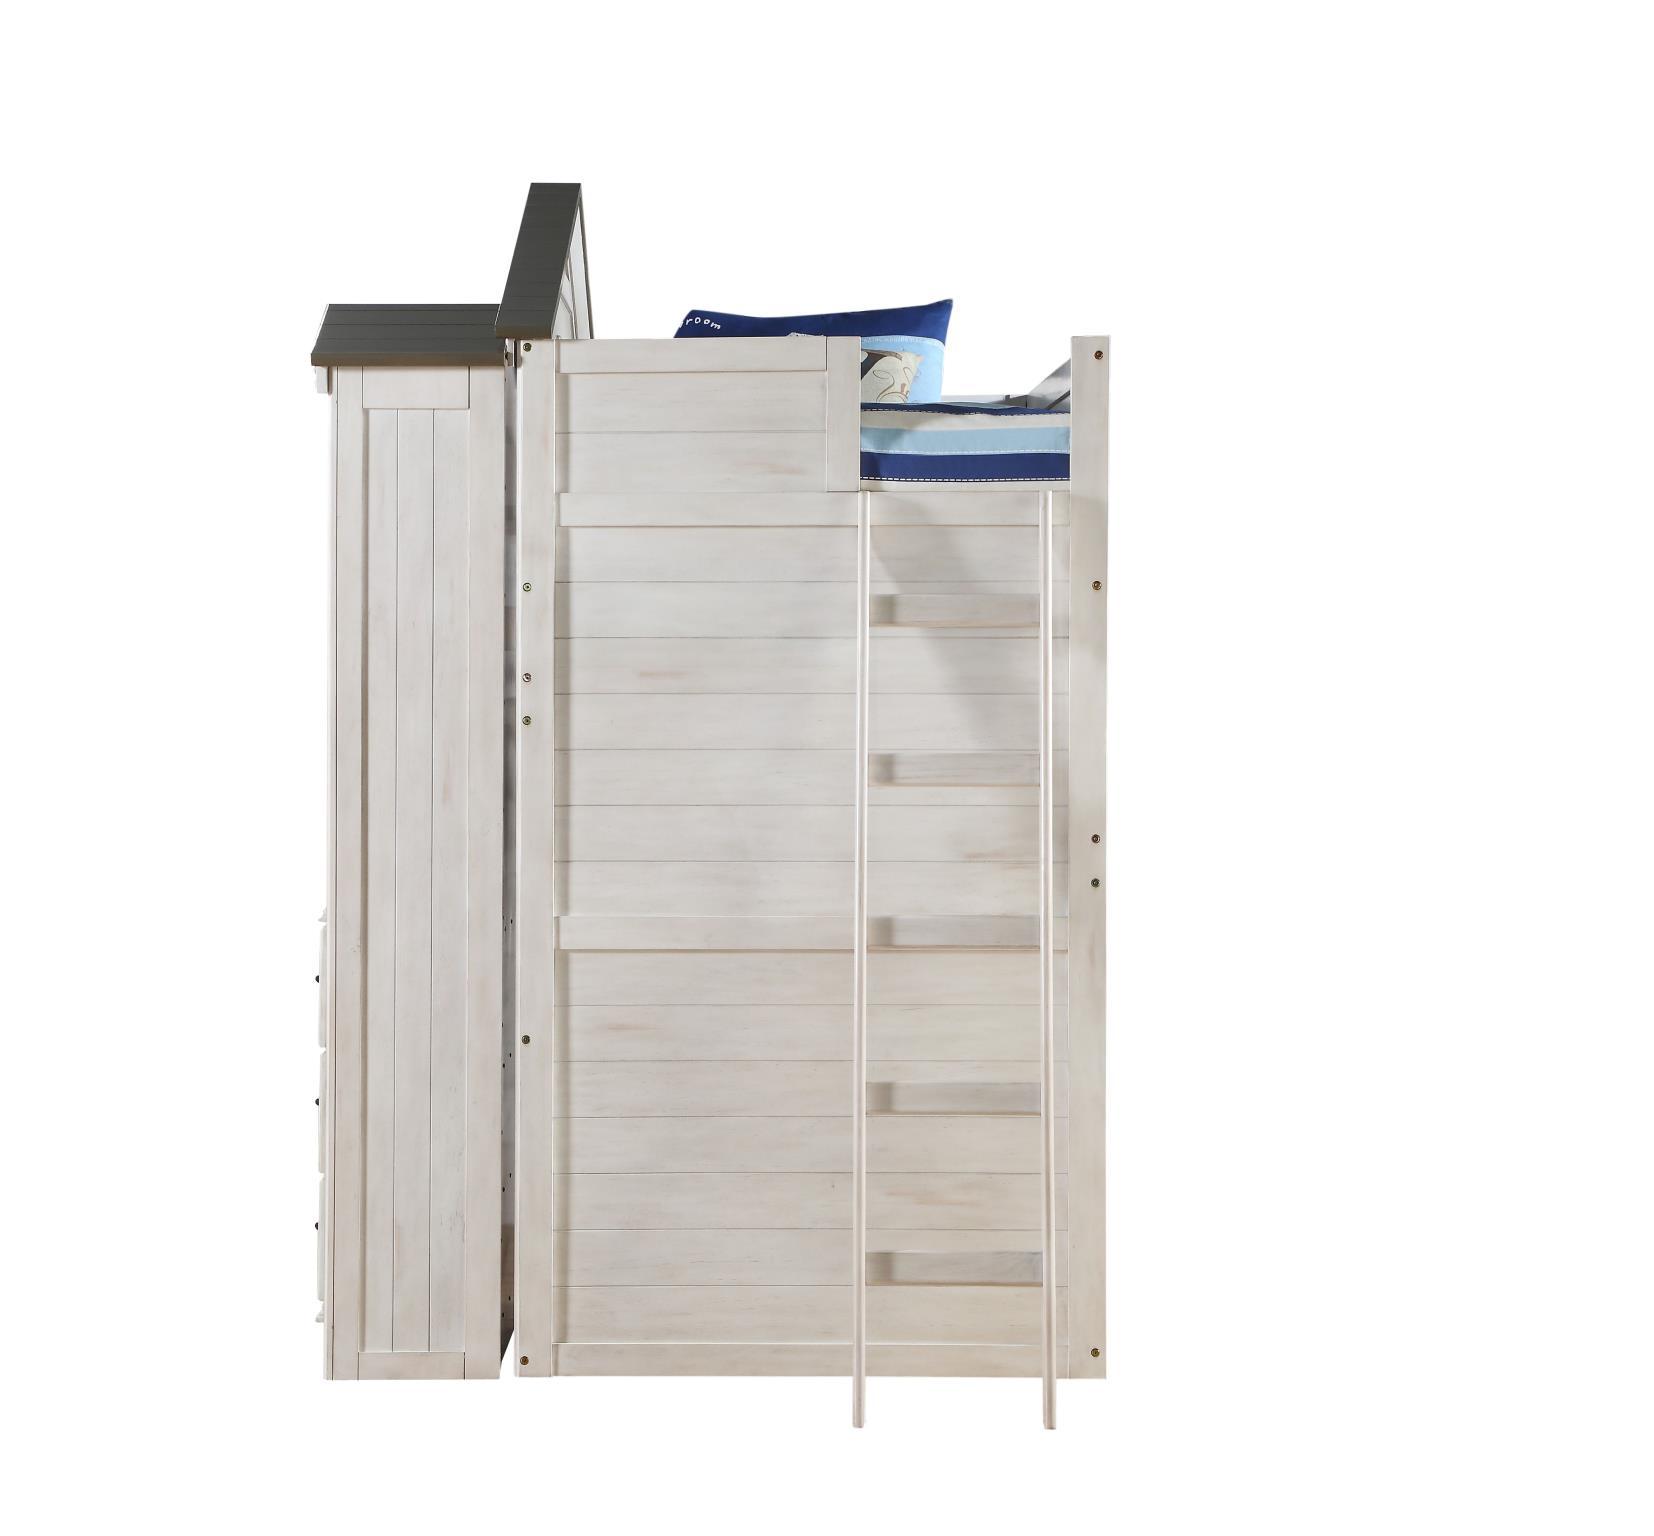 Treehouse Loft Bunk Bed Ladder Side w/ Bookcase